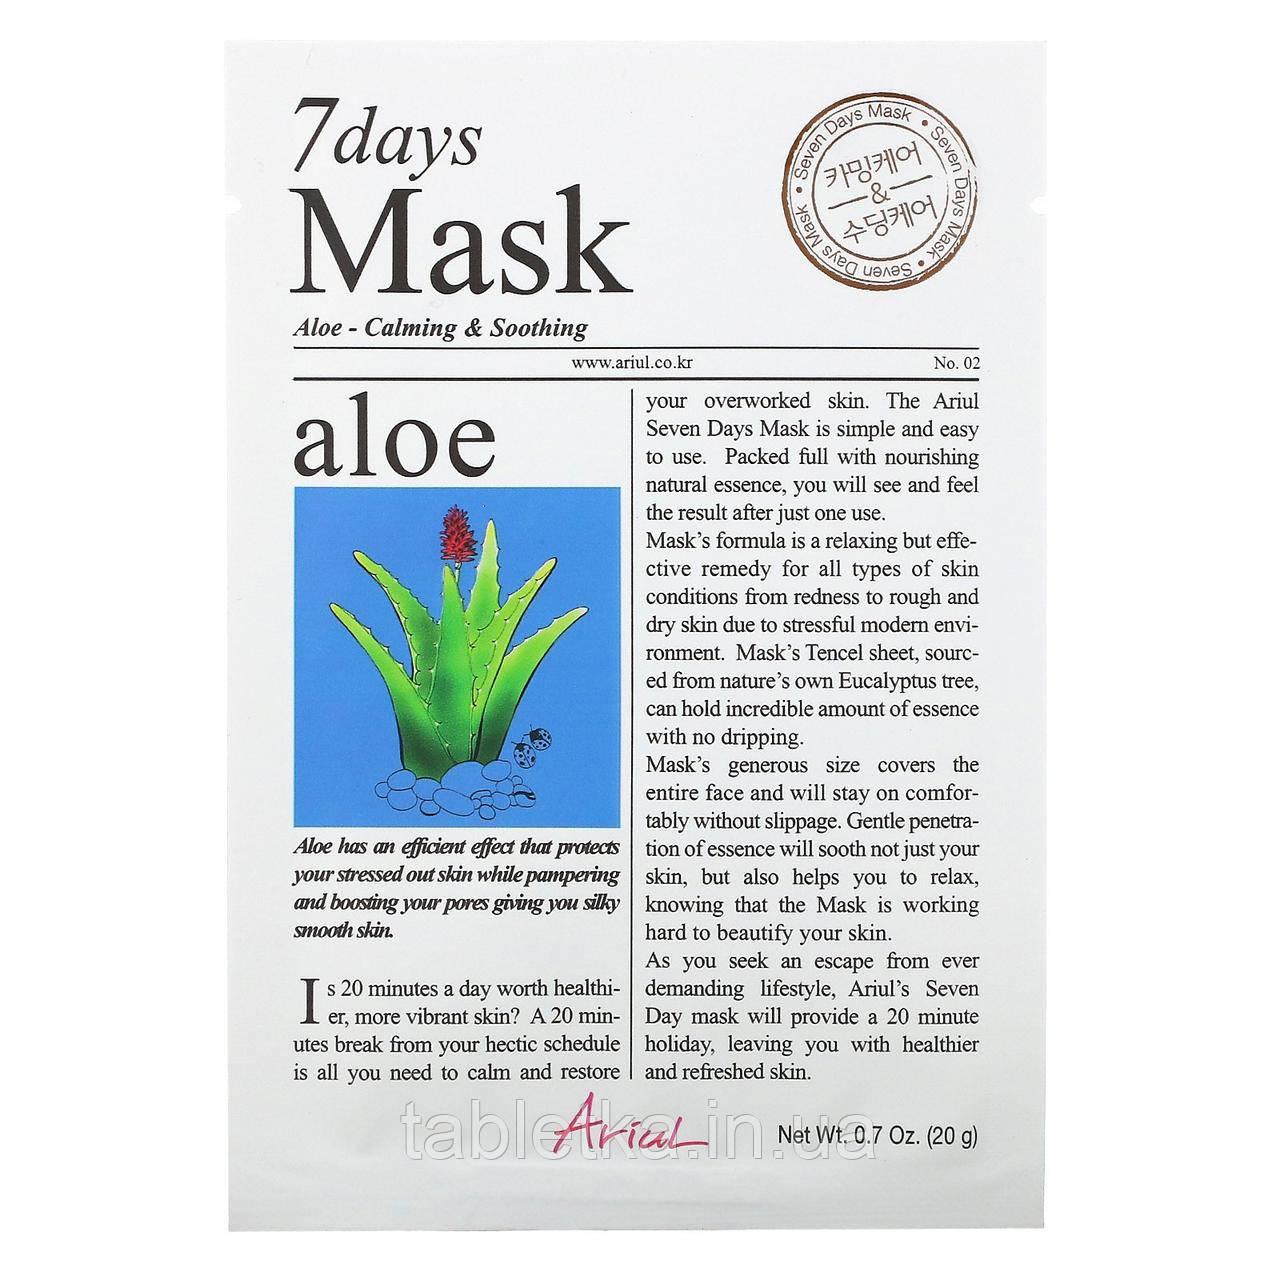 Ariul, 7 Days Beauty Mask, маска с алоэ, 1 шт., 20 г (0,7 унции)